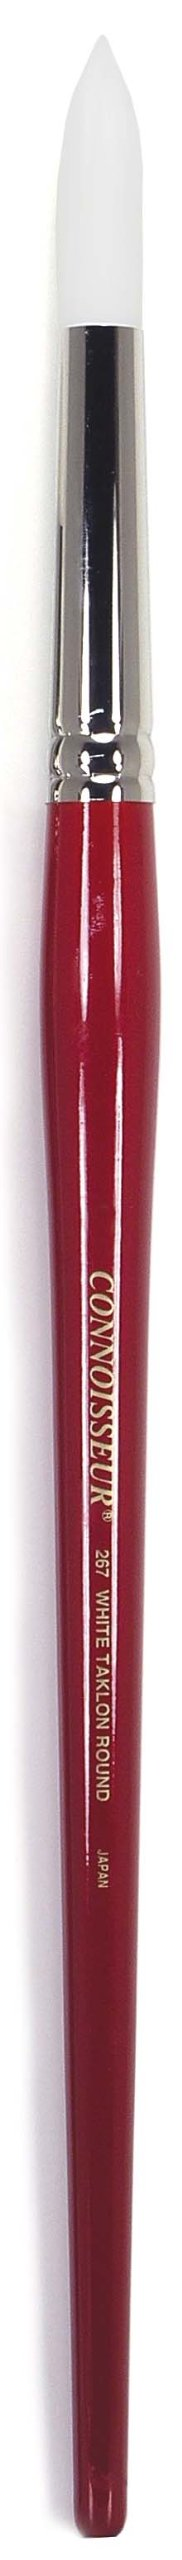 Connoisseur White Taklon All Media Brush, 4 Round by Connoisseur